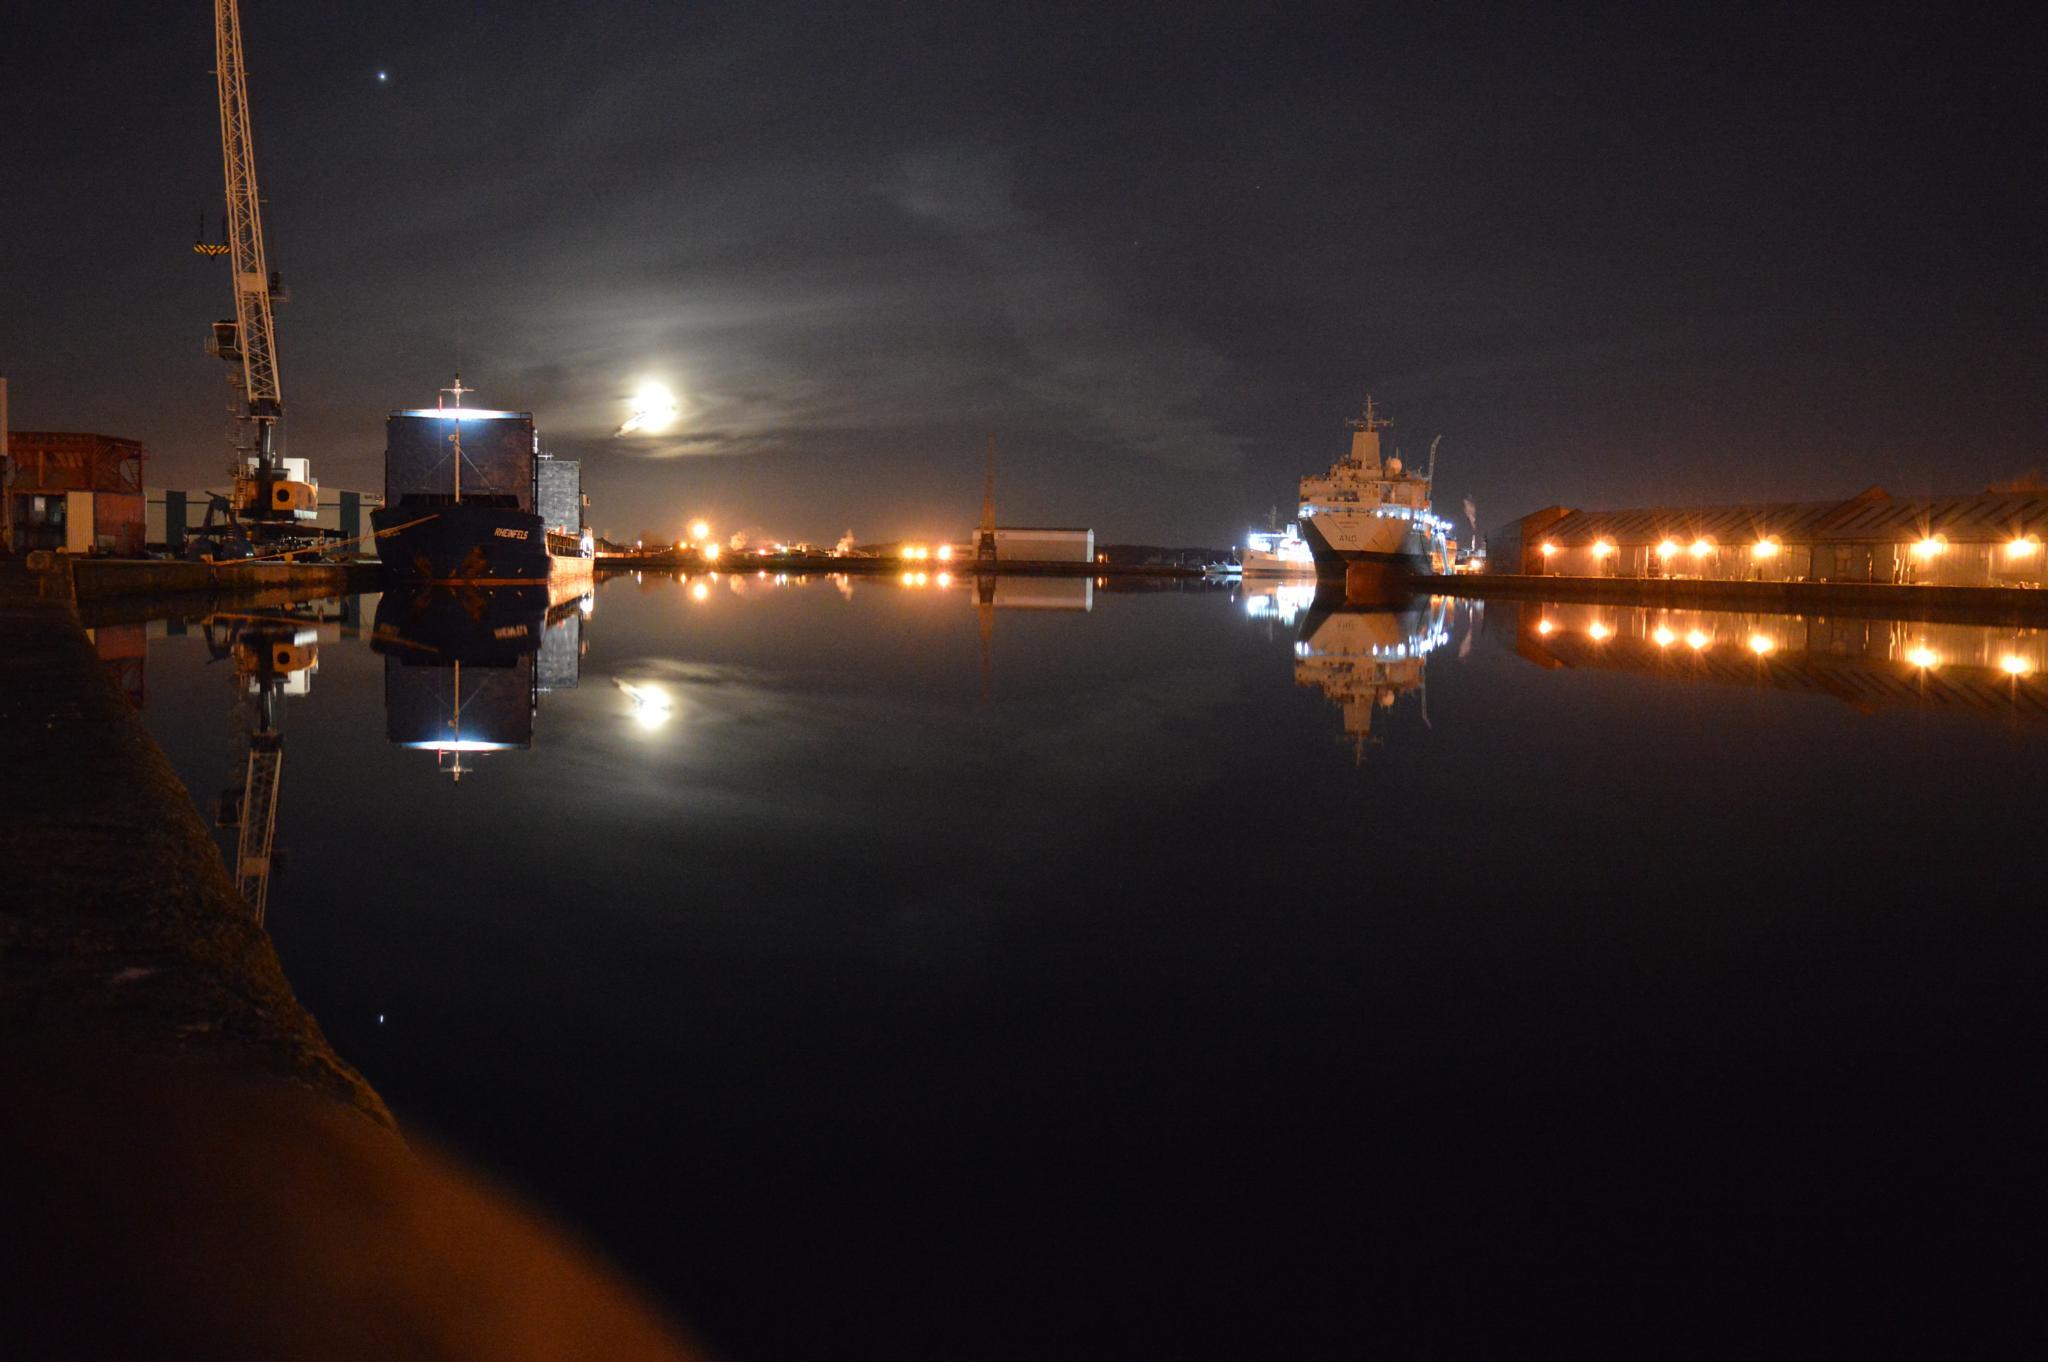 docks  by Phil Palmer